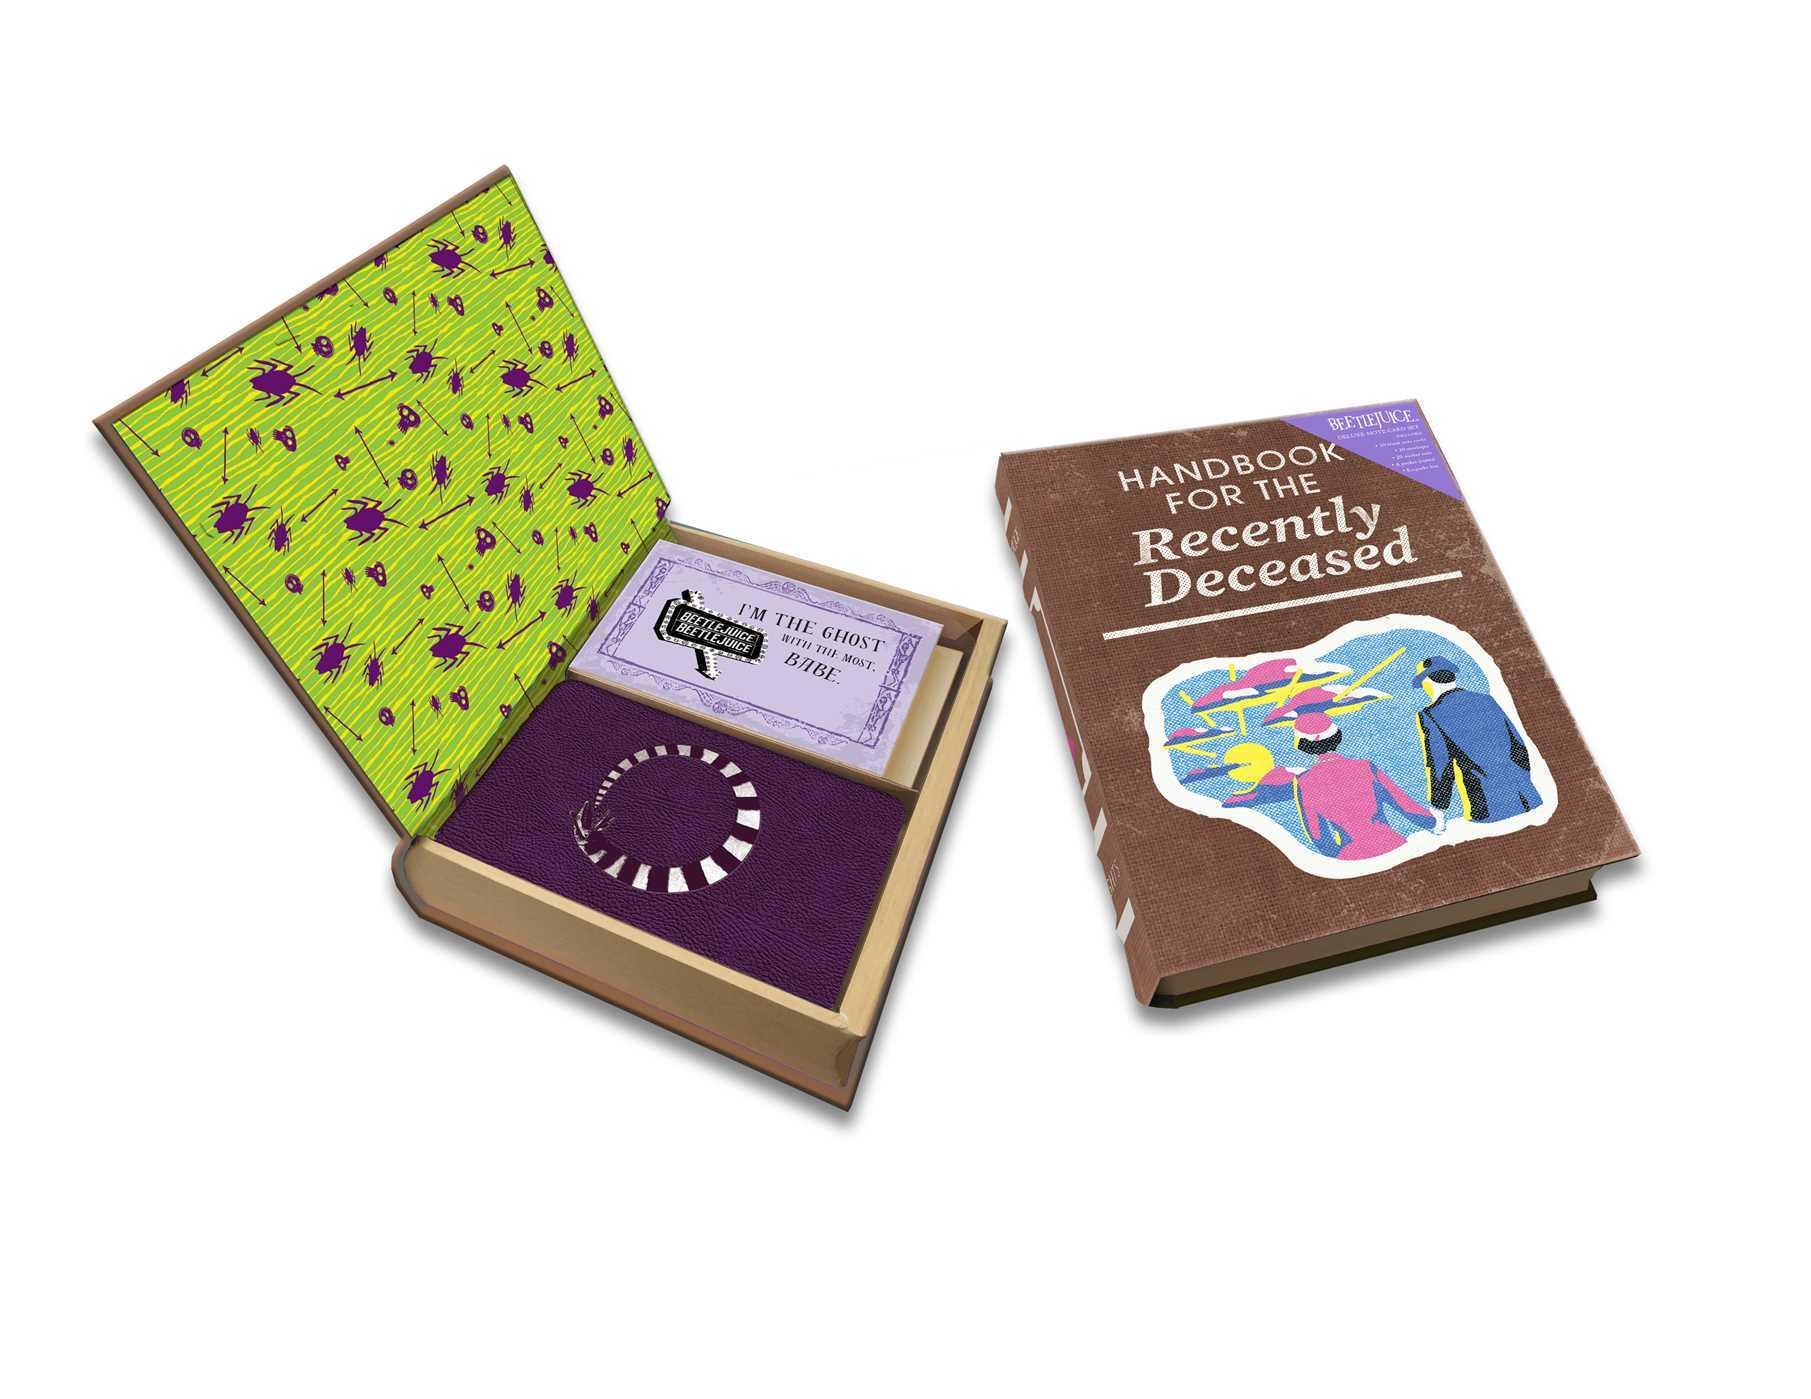 Beetlejuice: Handbook for the Recently Deceased Deluxe Note Card Set (With Keepsake Book Box)